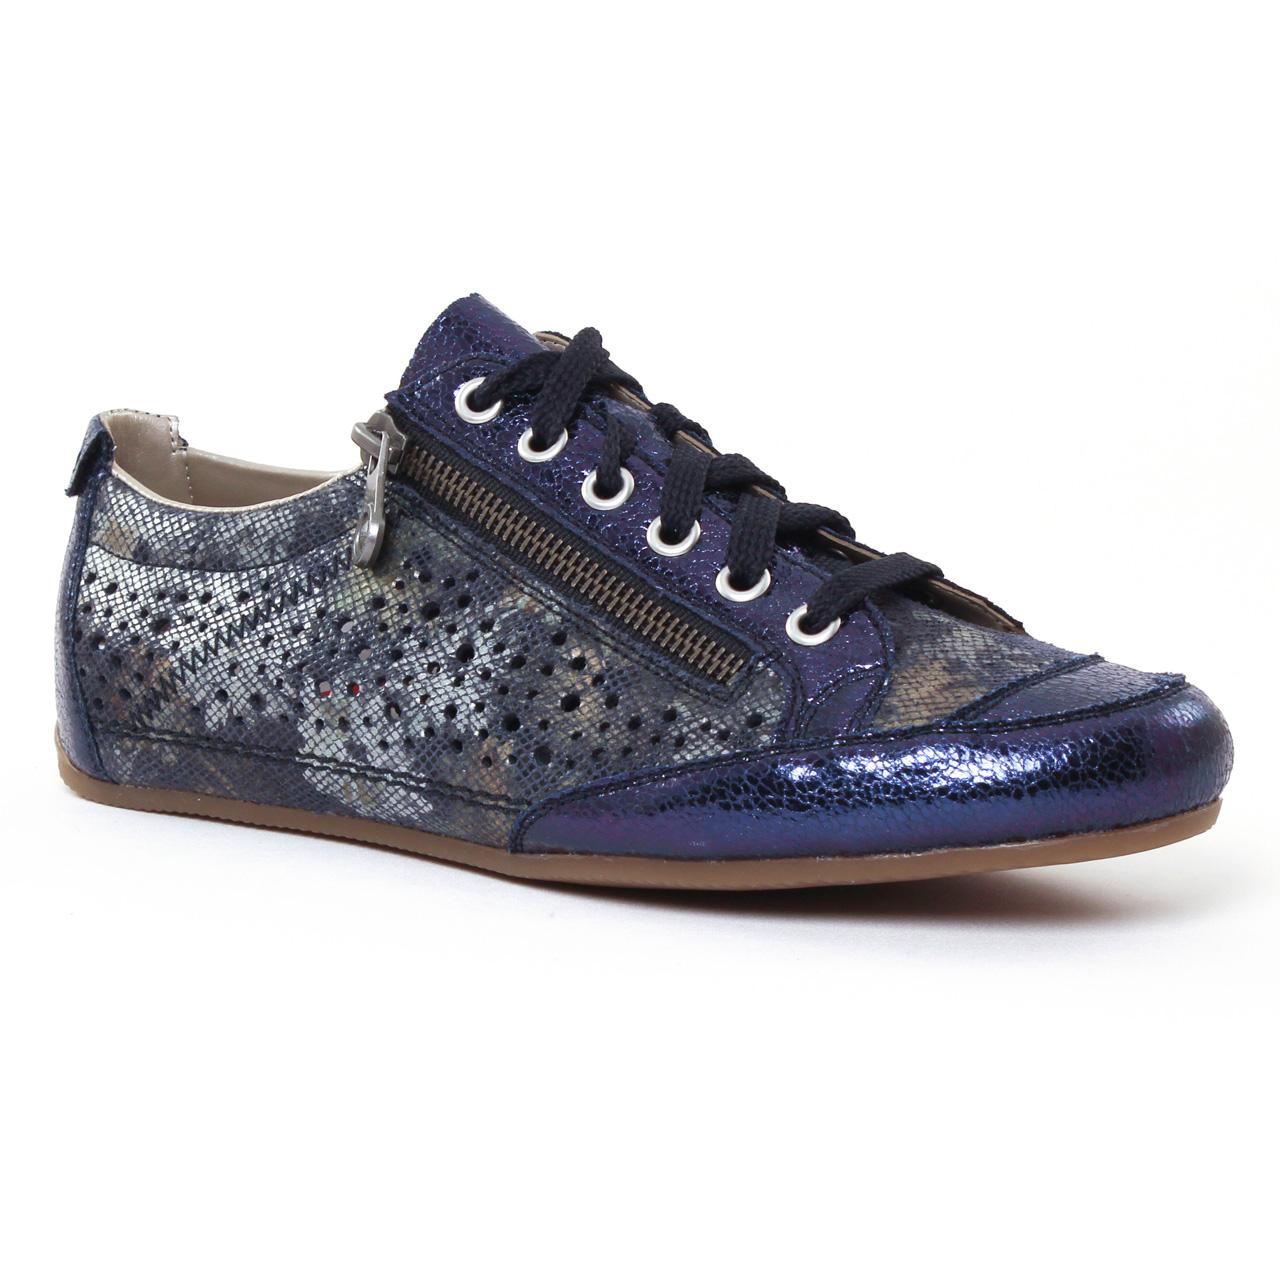 chaussures rieker bleu. Black Bedroom Furniture Sets. Home Design Ideas